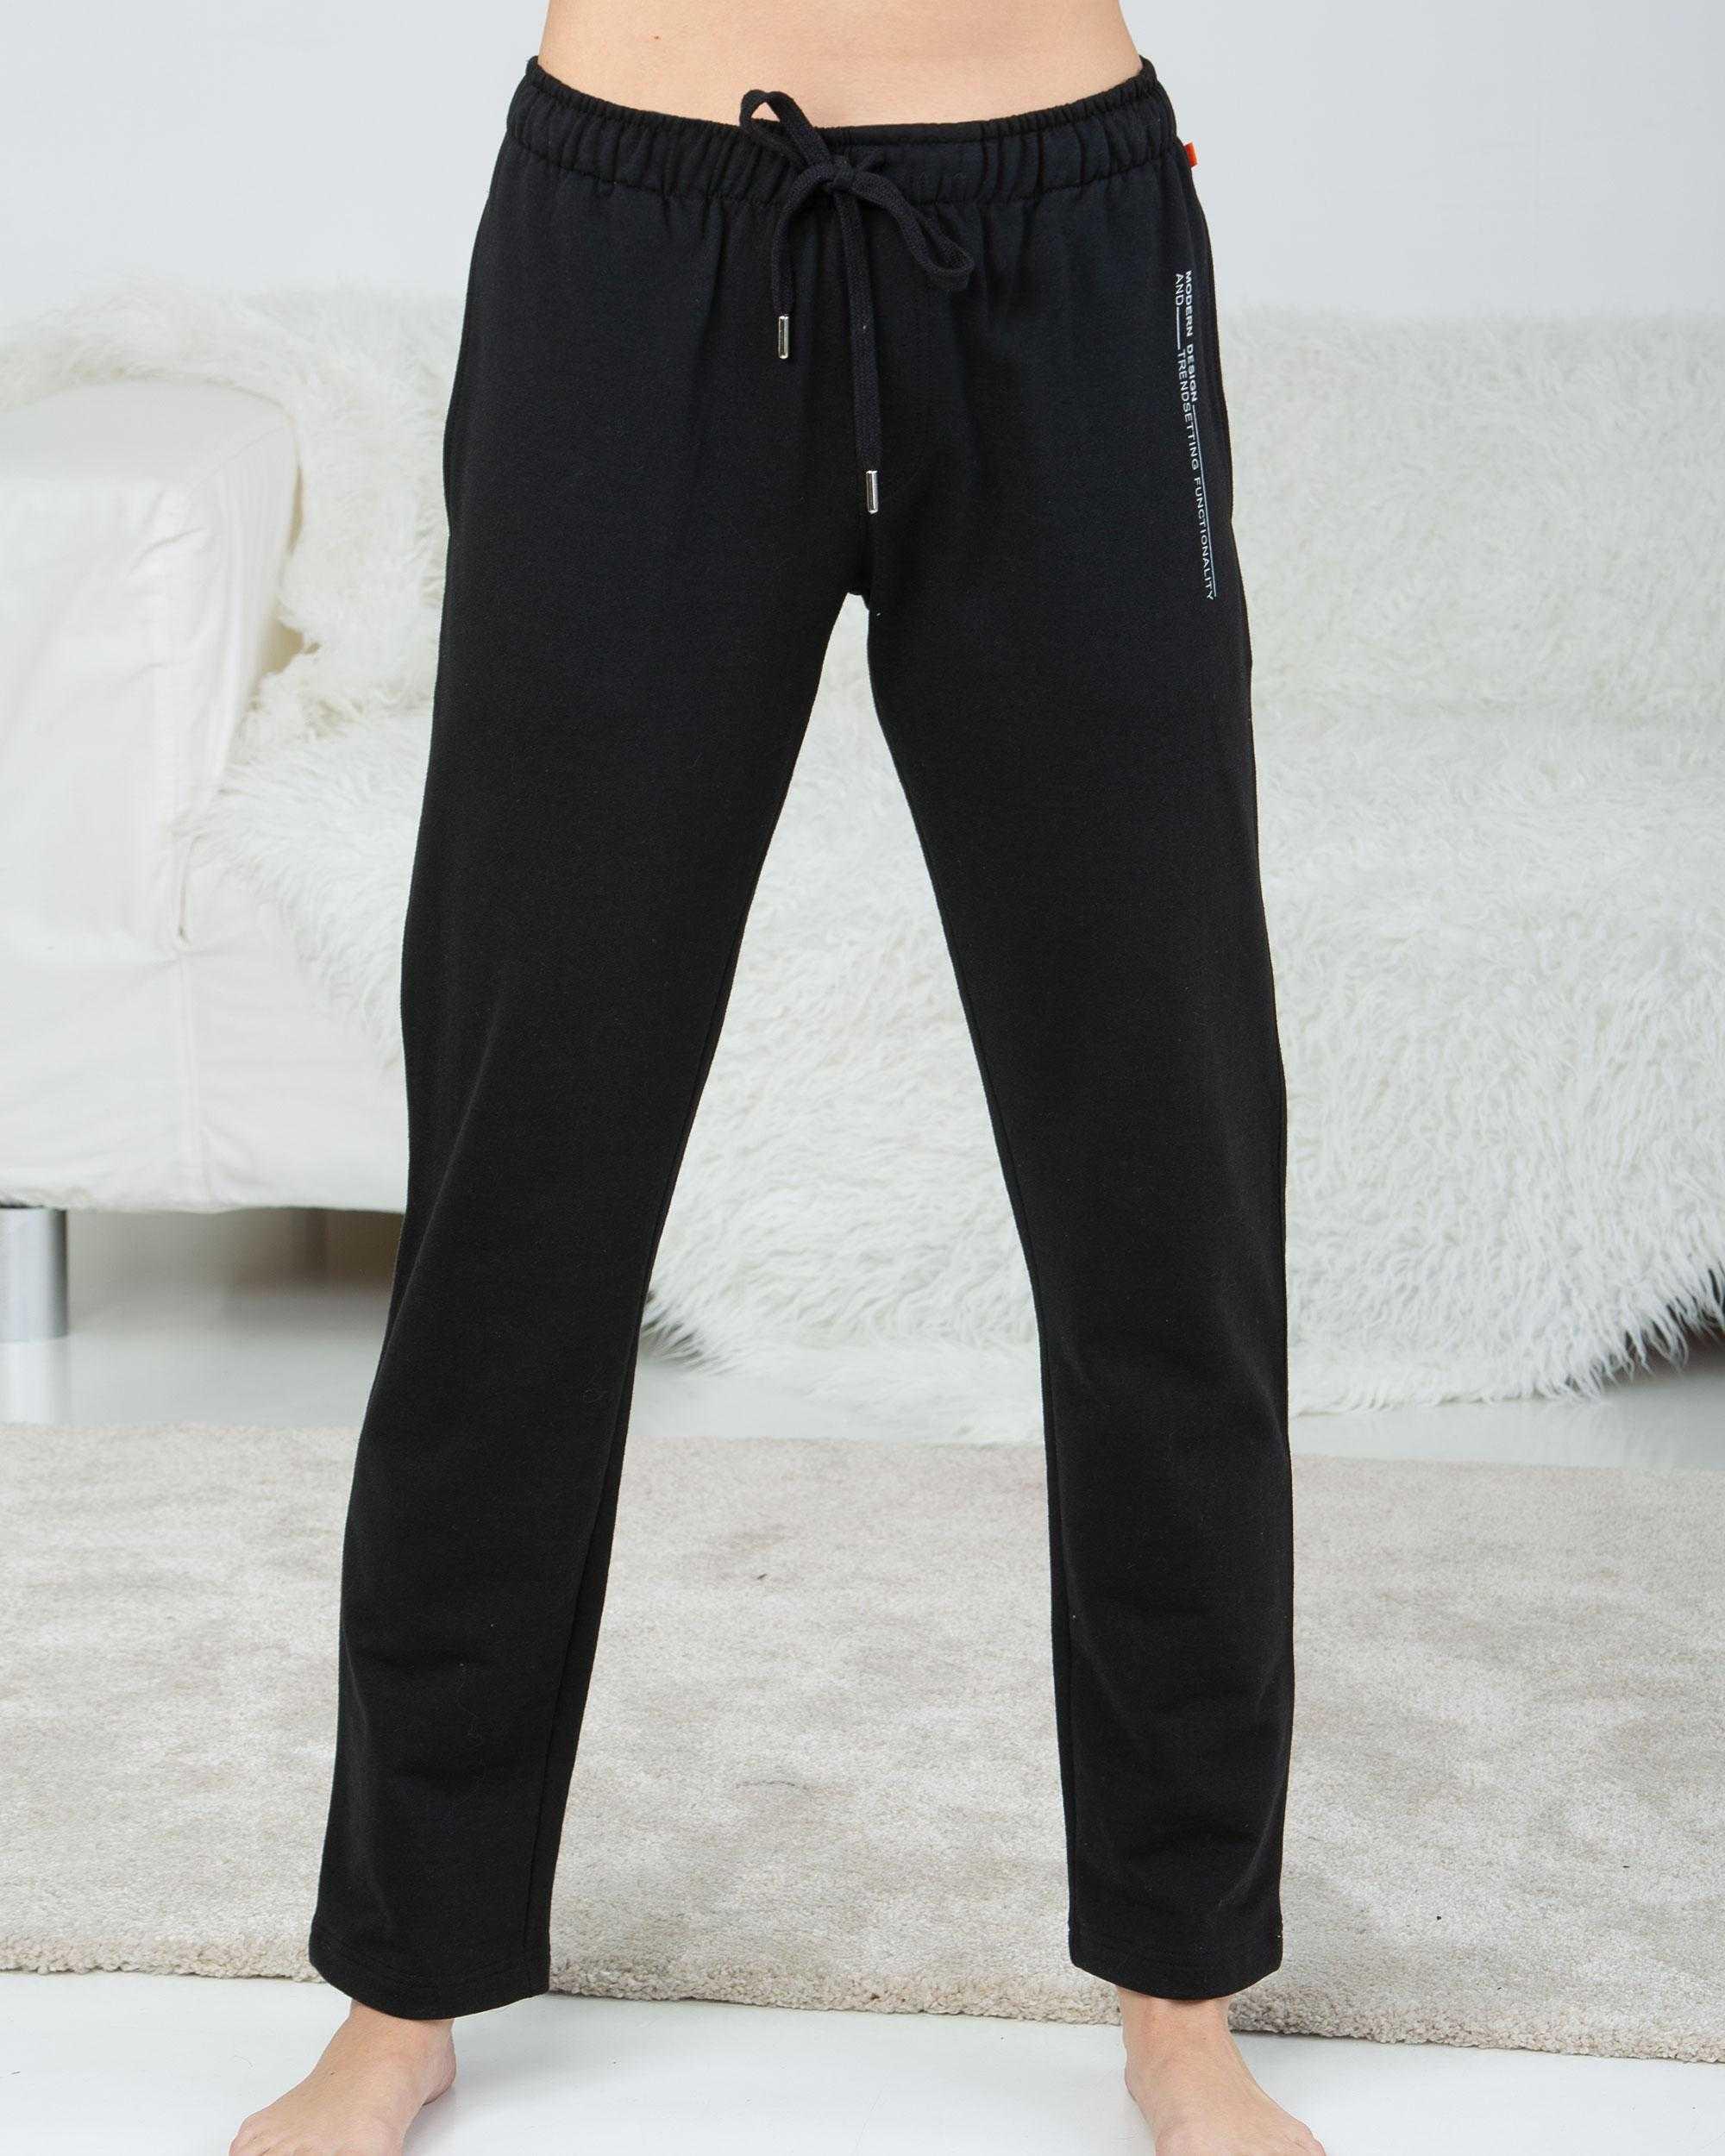 Pantalón Pijama Caballero Modern Design Massana TALLAS: m, l; COLOR: negro  - HOMBRE  - PEPI GUERRA